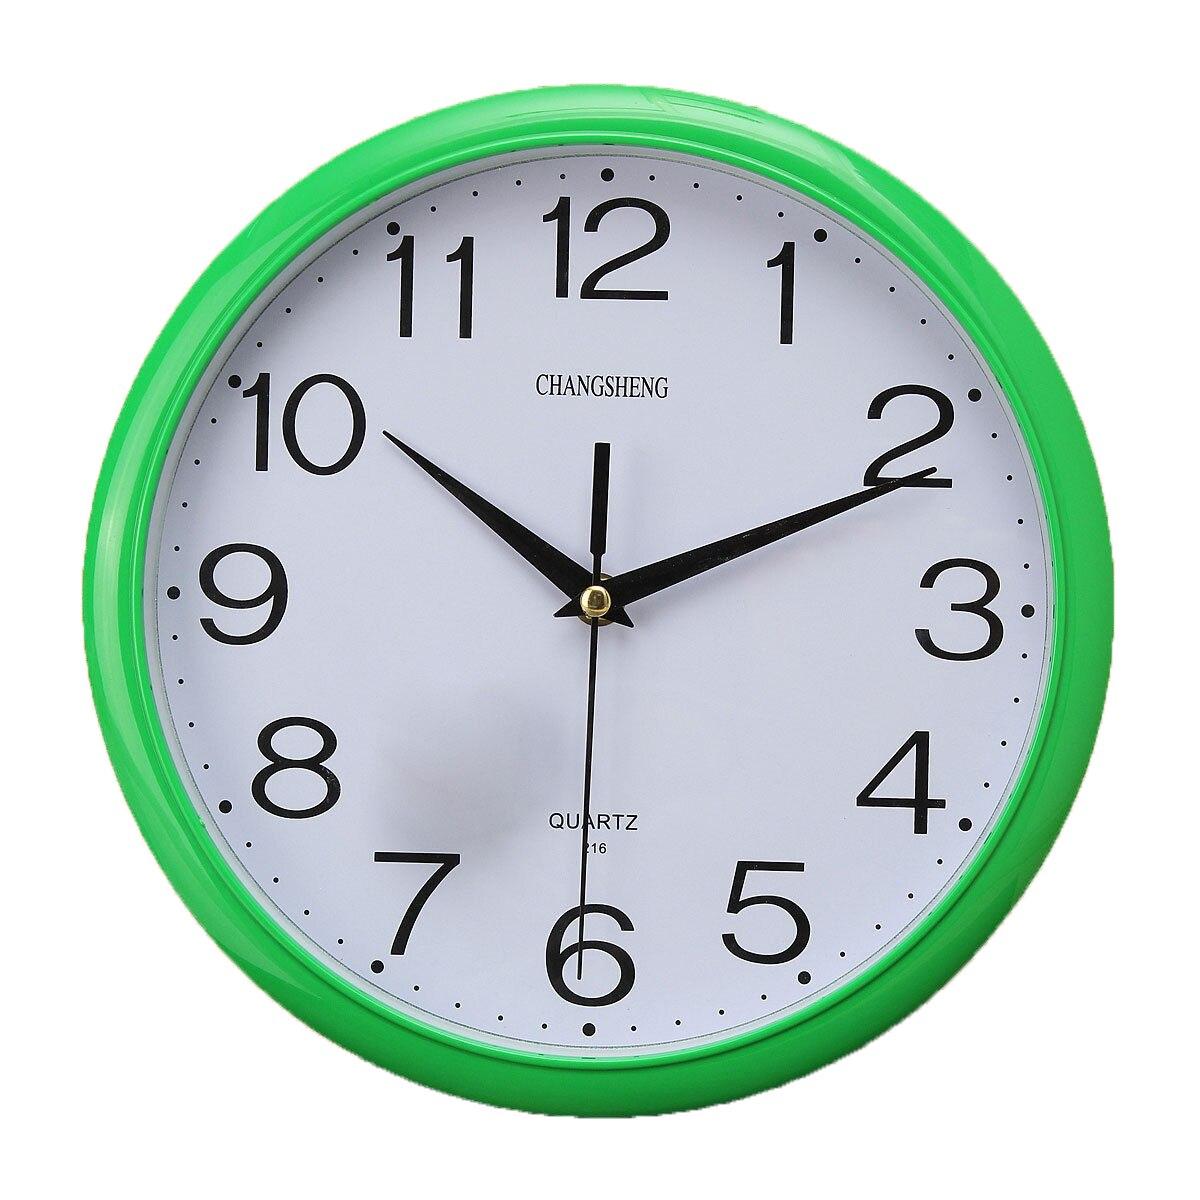 Best Large Vintage Round Modern Home Bedroom Retro Time Kitchen Wall Clock  Quartz Green(China